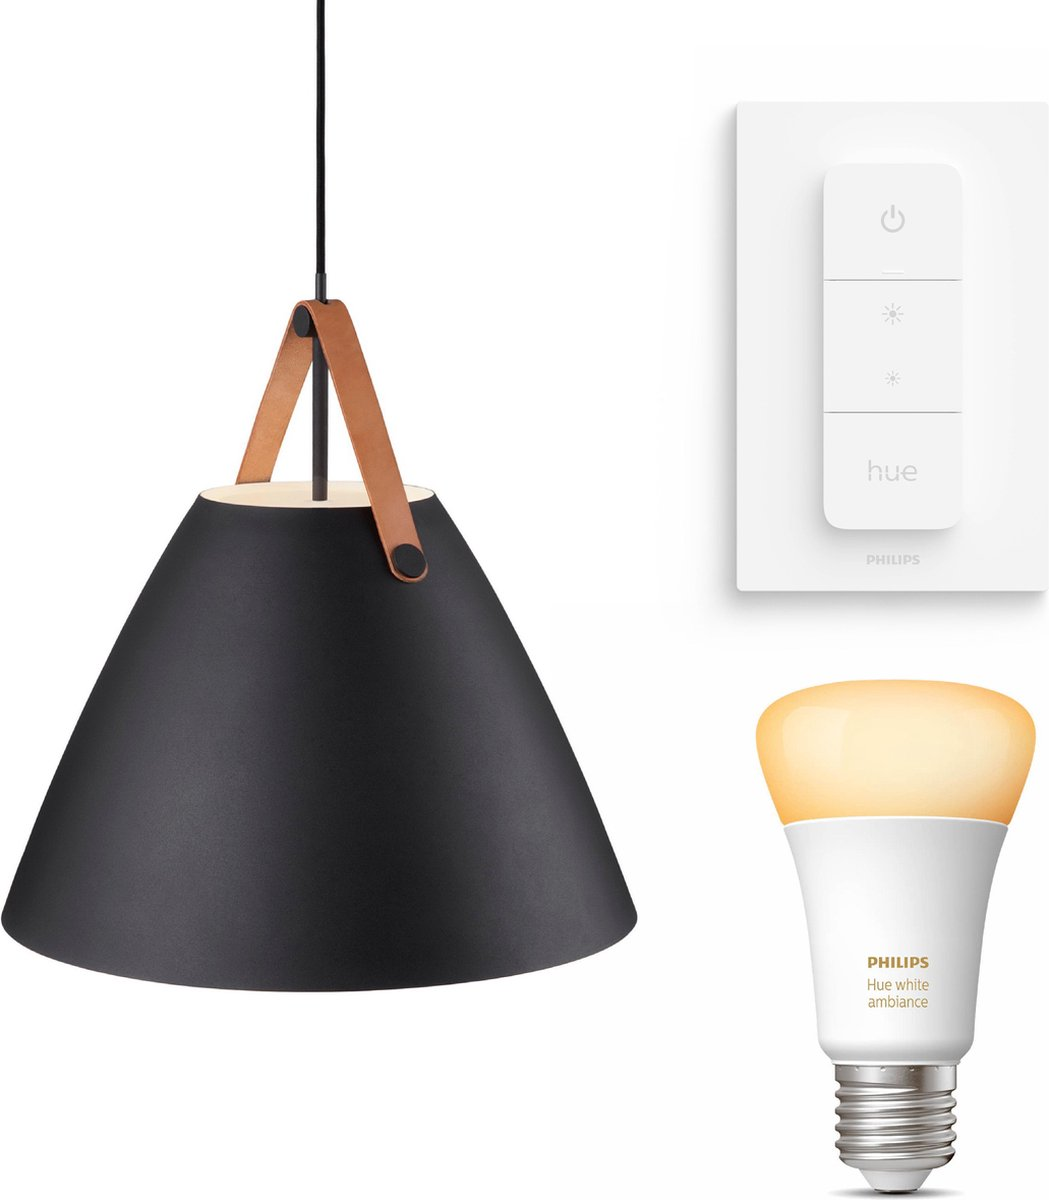 Nordlux Strap 48 hanglamp - LED - zwart - 1 lichtpunt - Incl. Philips Hue White Ambiance E27 & dimmer